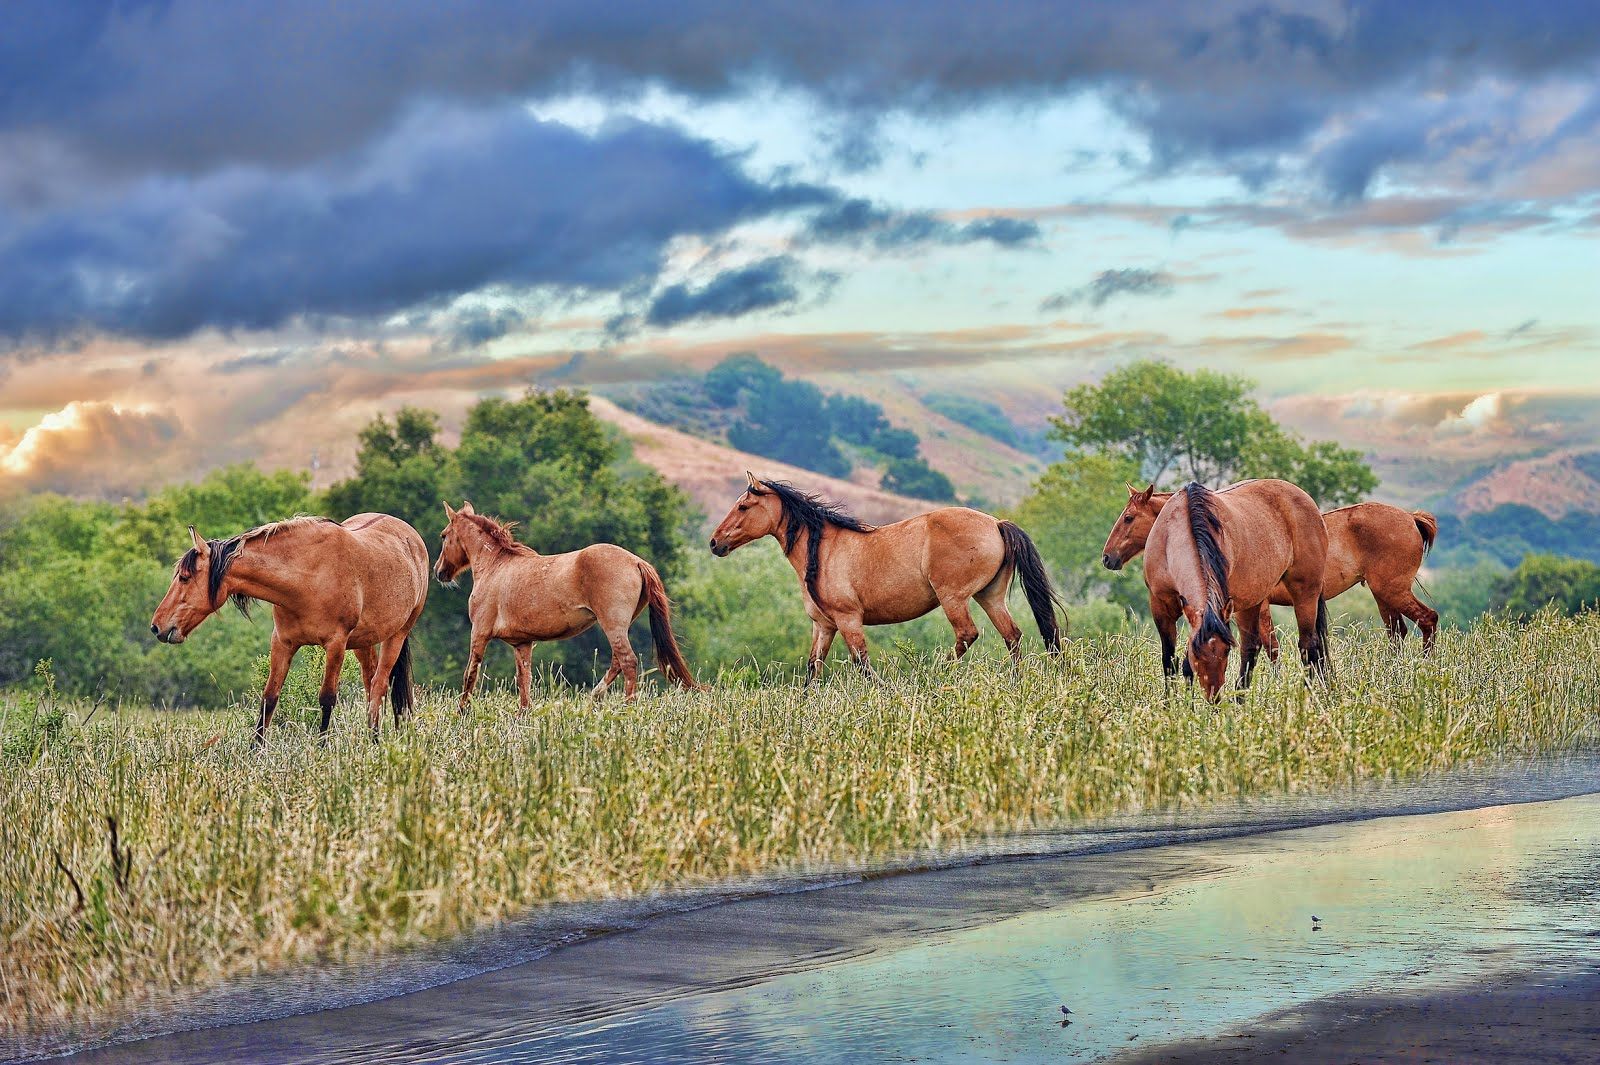 http://1.bp.blogspot.com/-YFyOwYwNeUA/UPxcRvl0CkI/AAAAAAABh-I/OL6NUHXgQVo/s1600/caballos-en-las-praderas-junto-al-rio-de-agua-clara-horses-near-to-the-river.jpg